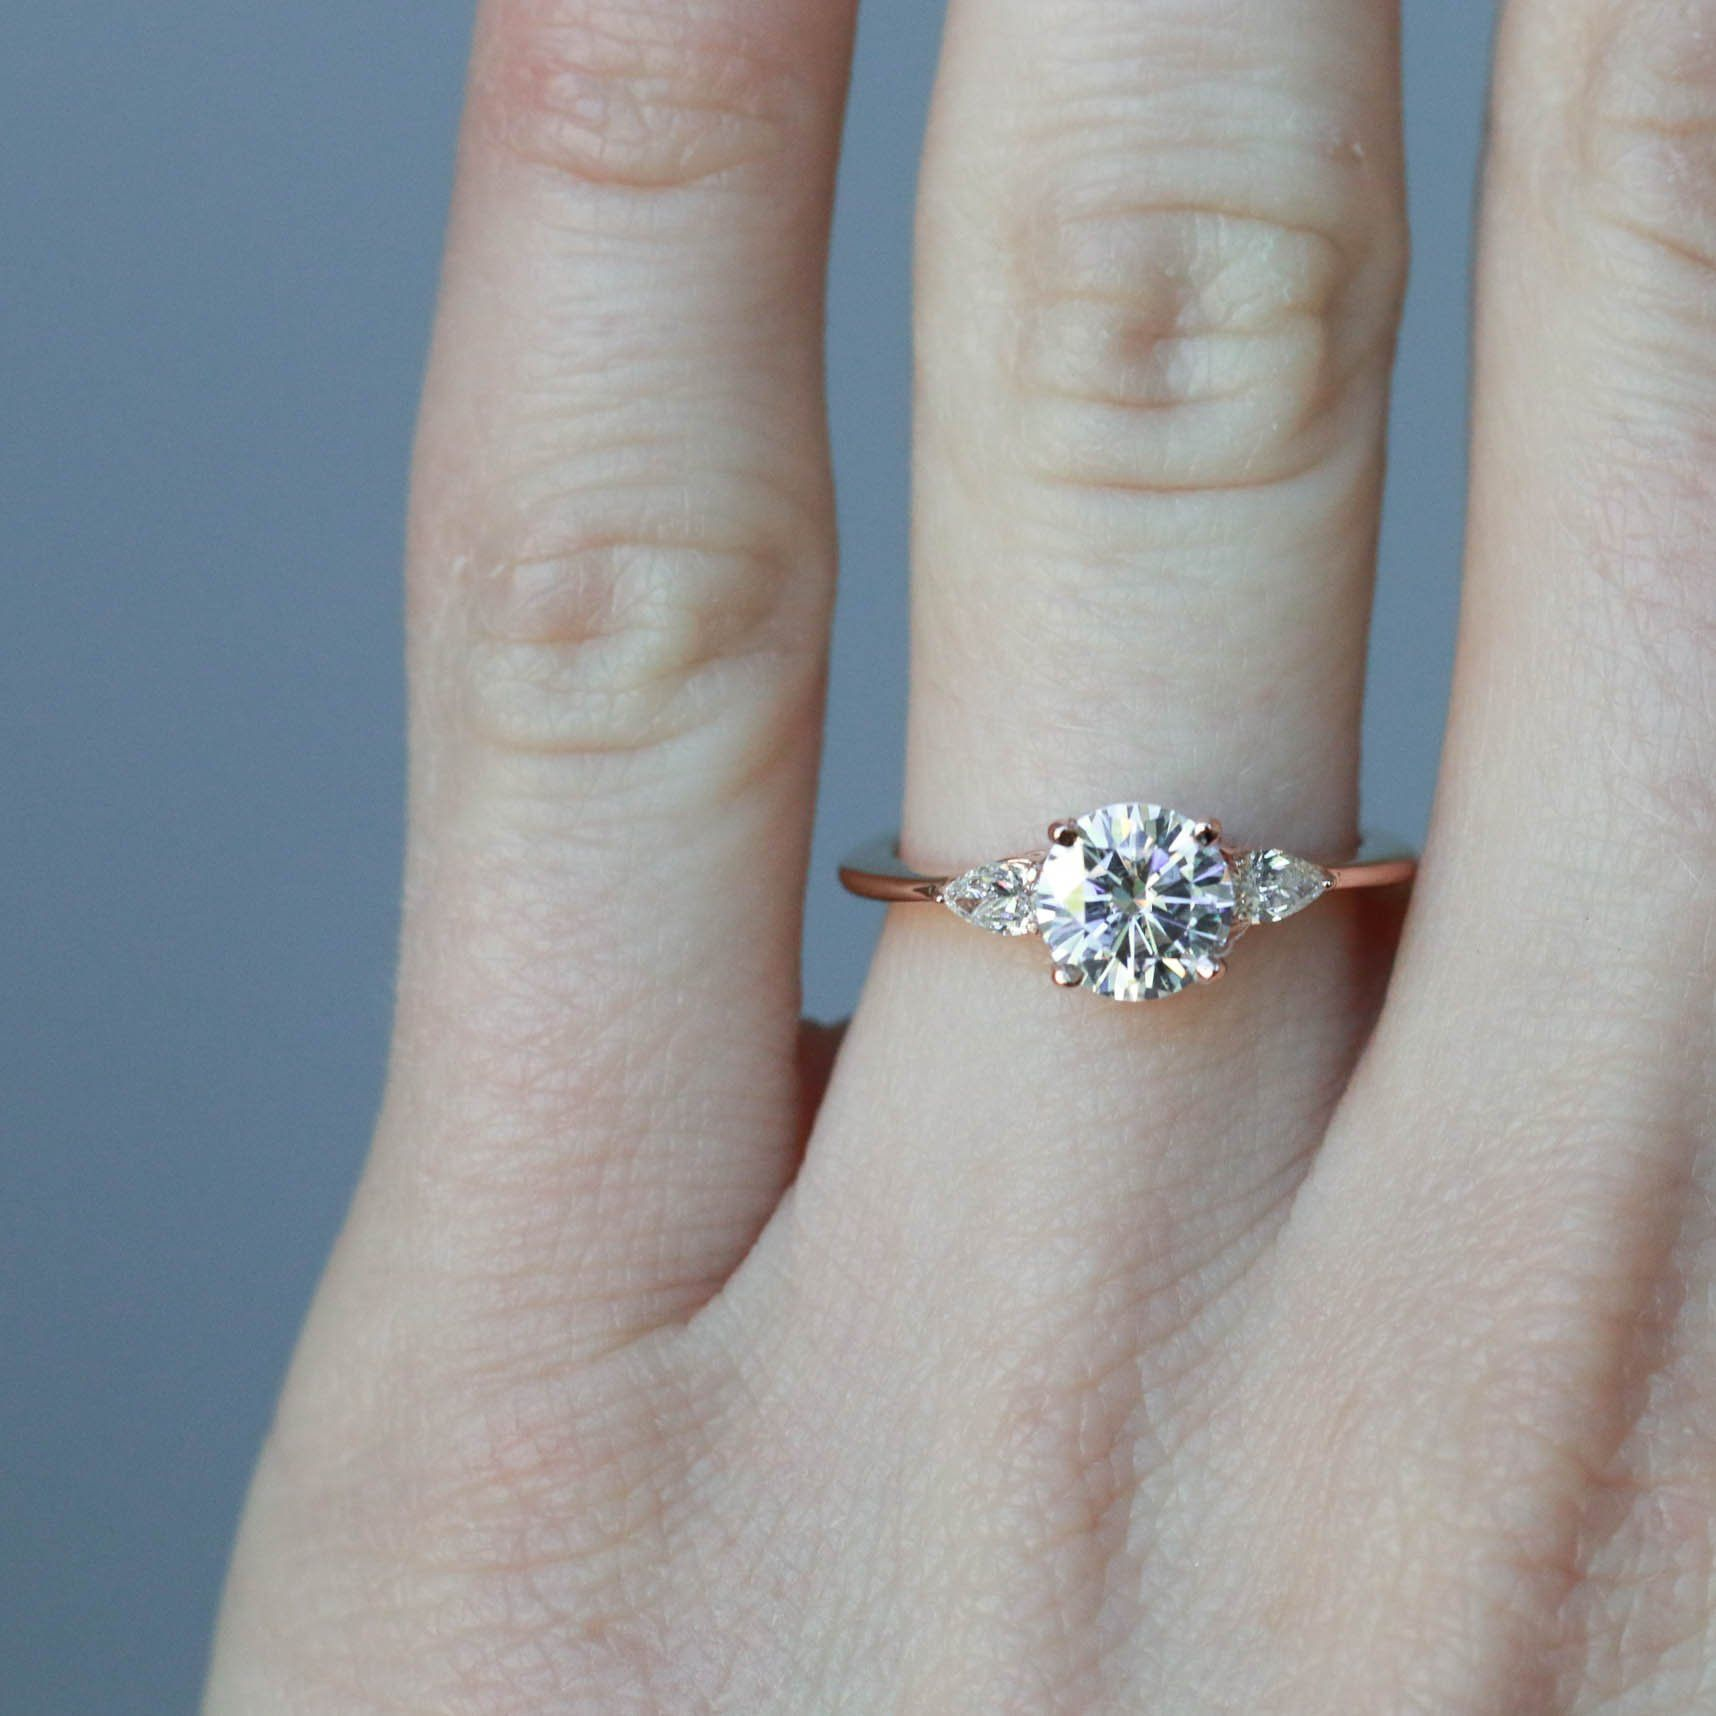 Engagement Rings Netherlands: Engagement Rings, Wedding